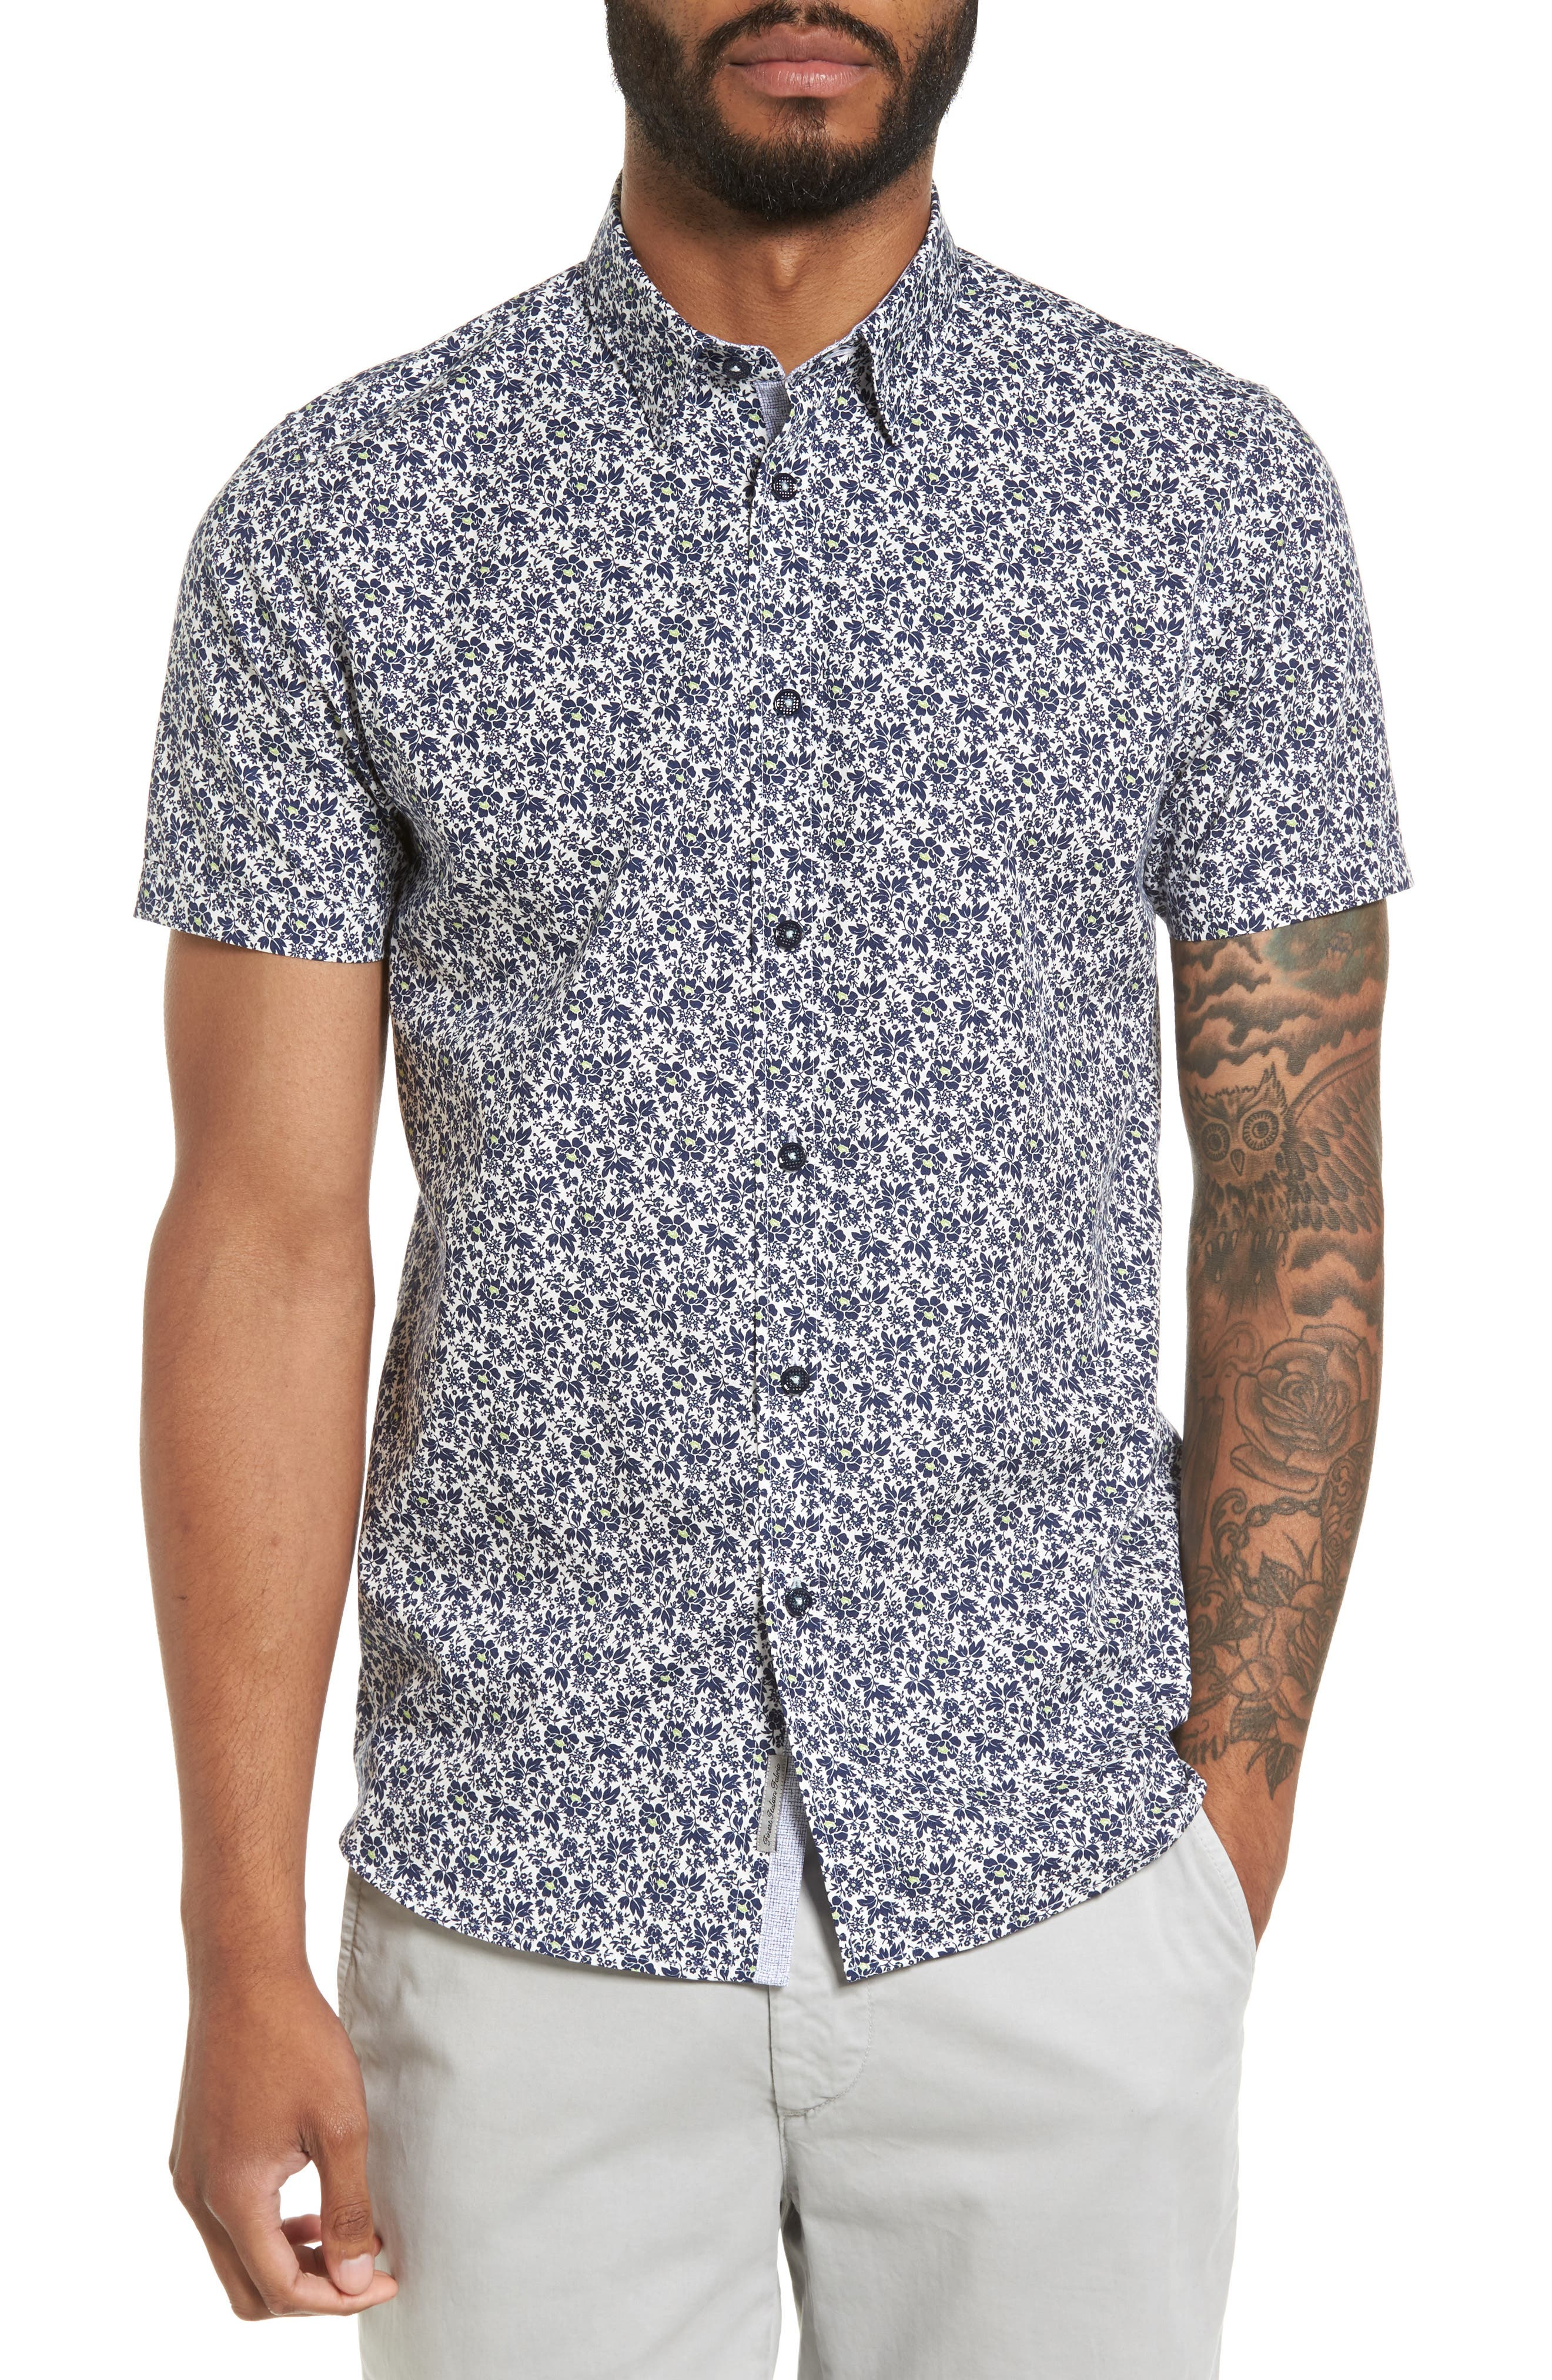 Alygar Slim Fit Floral Woven Shirt,                         Main,                         color, 402